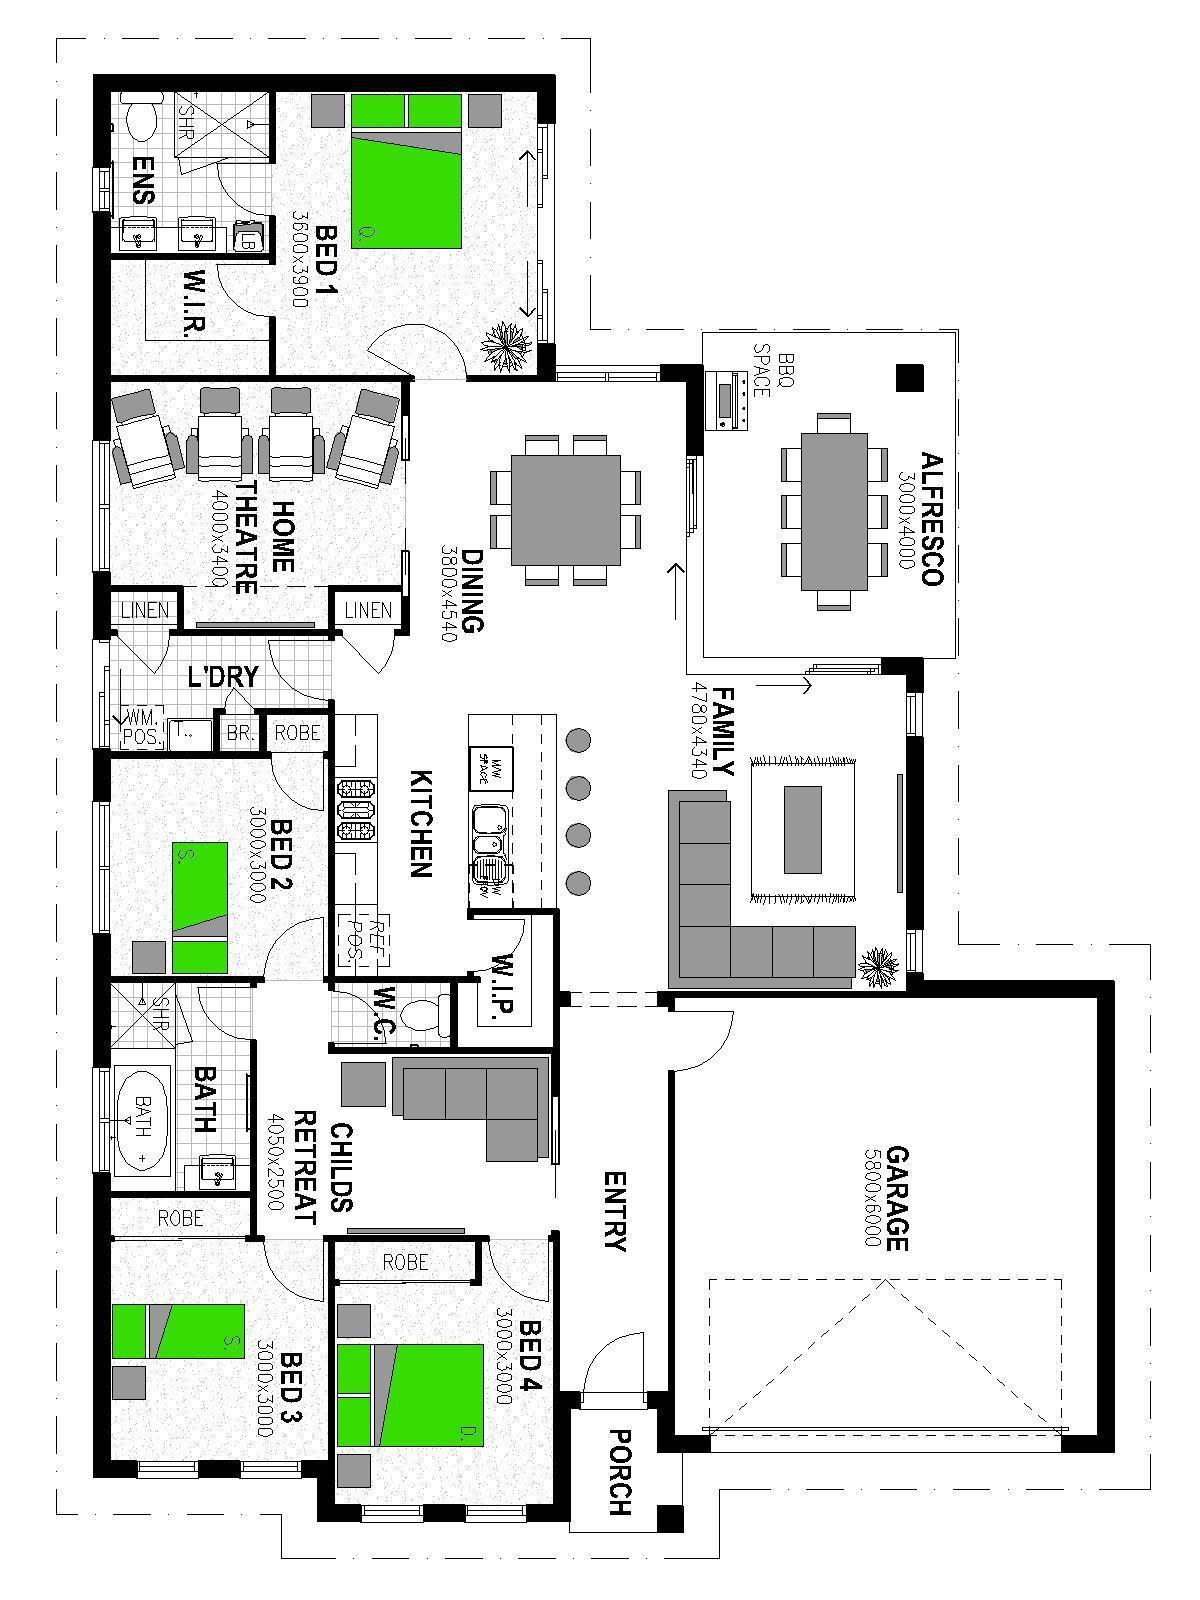 LOT 53 'MANOOKA ESTATE' MOGGILL Floorplan